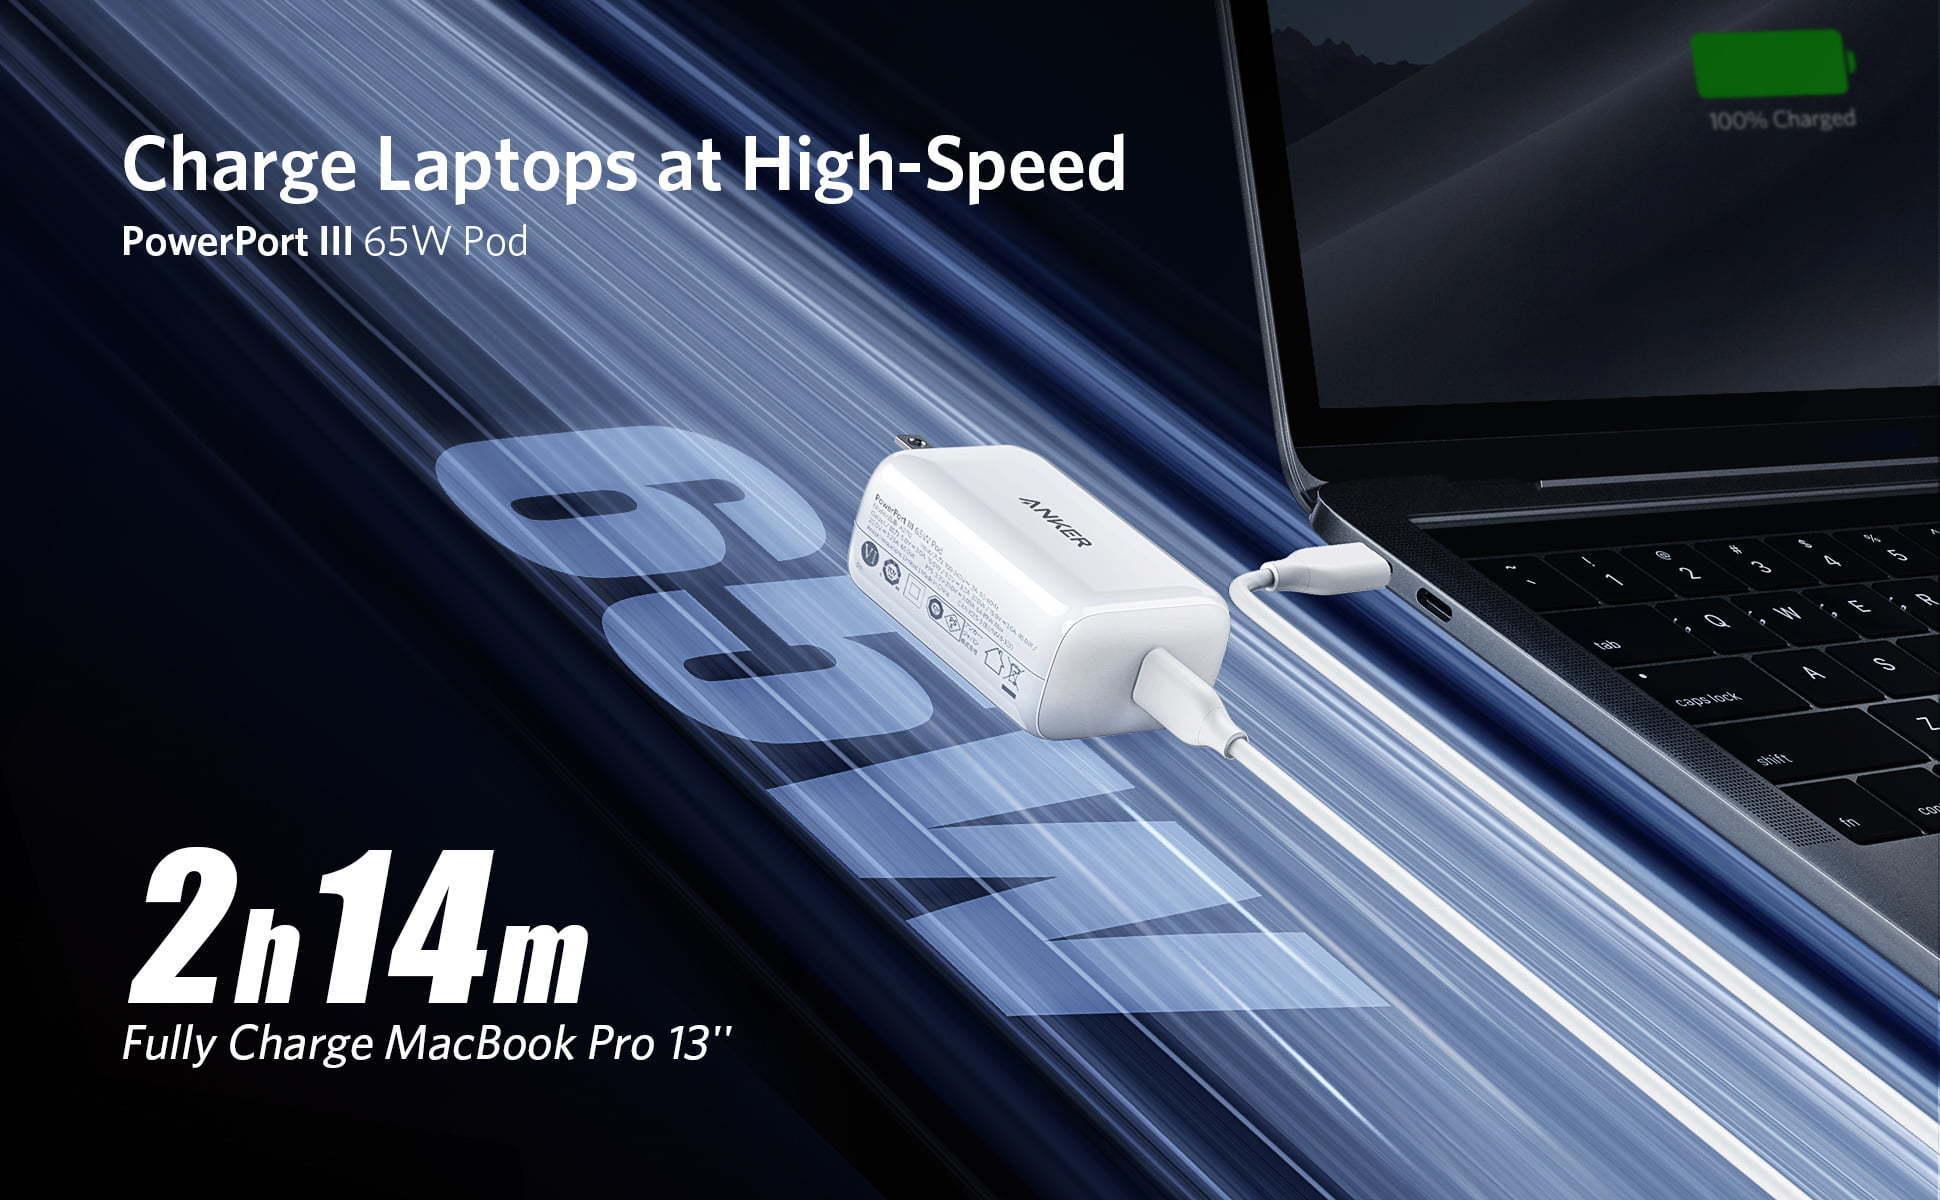 PowerPort III 65W Pod